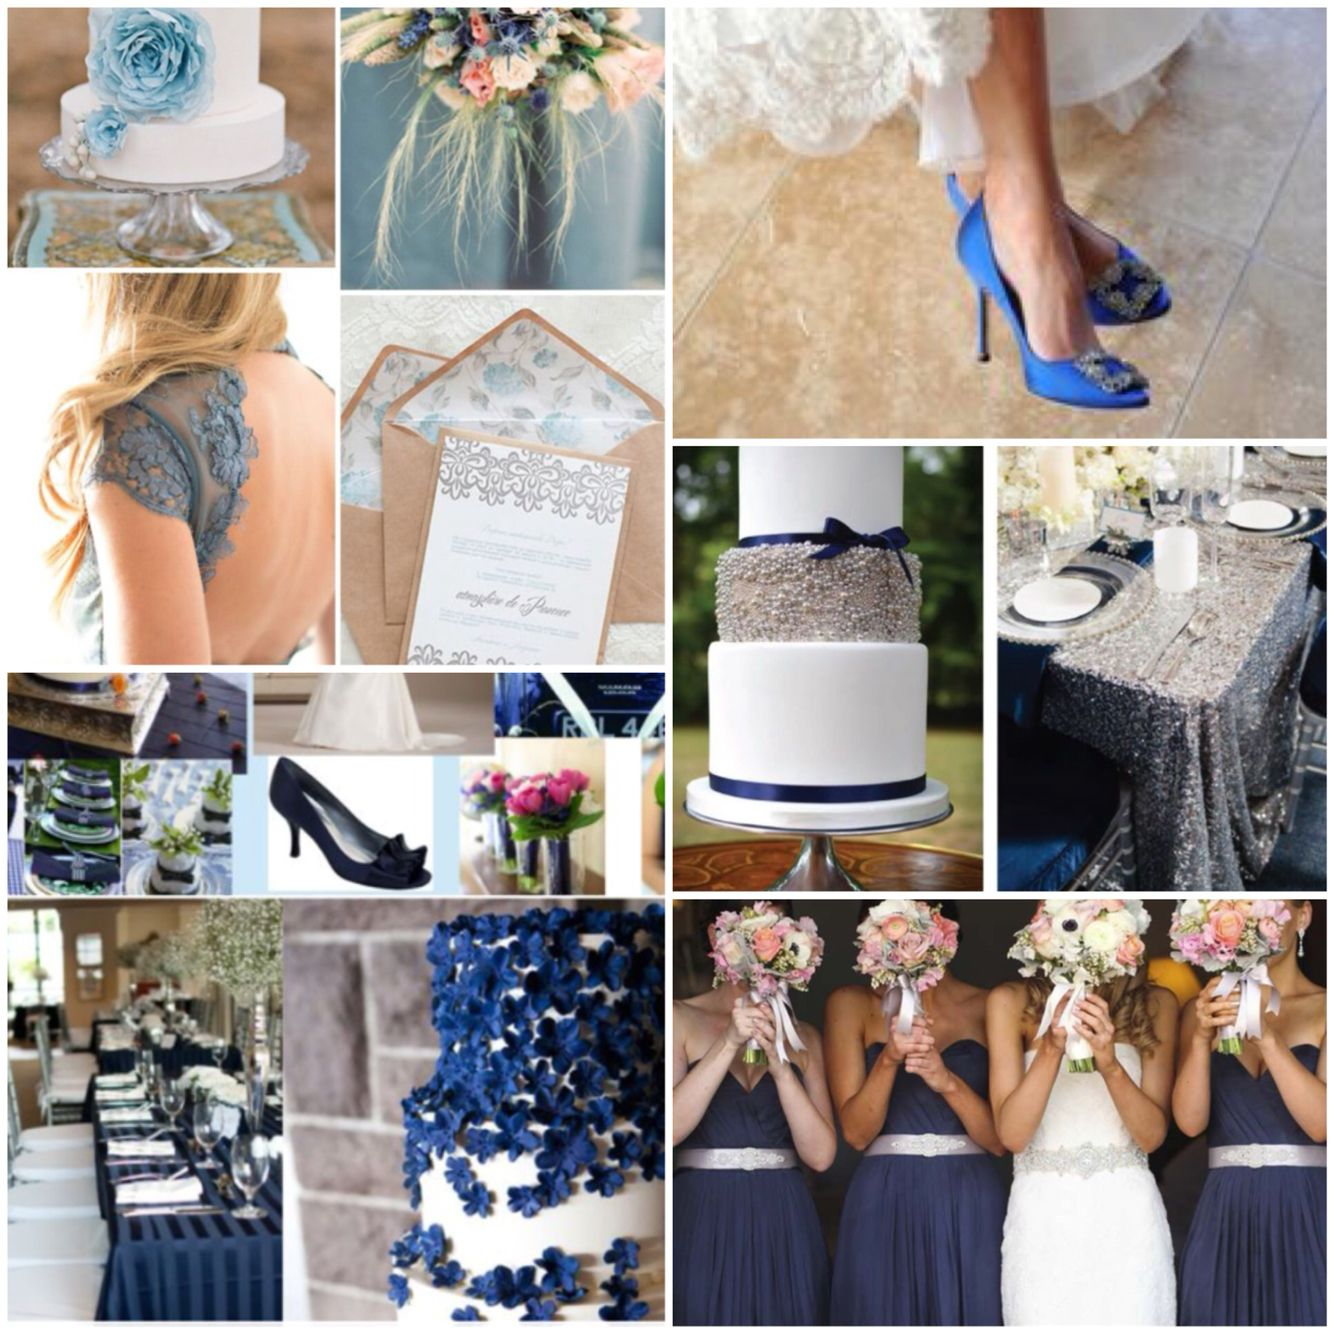 Blue wedding theme! #wedding #bluewedding #weddingtheme #weddingideas #bride #somethingblue #manolos #weddingshoes #tabledecor #weddingtable #groom #brideandgroom #bridesmaids #dresses #shoes